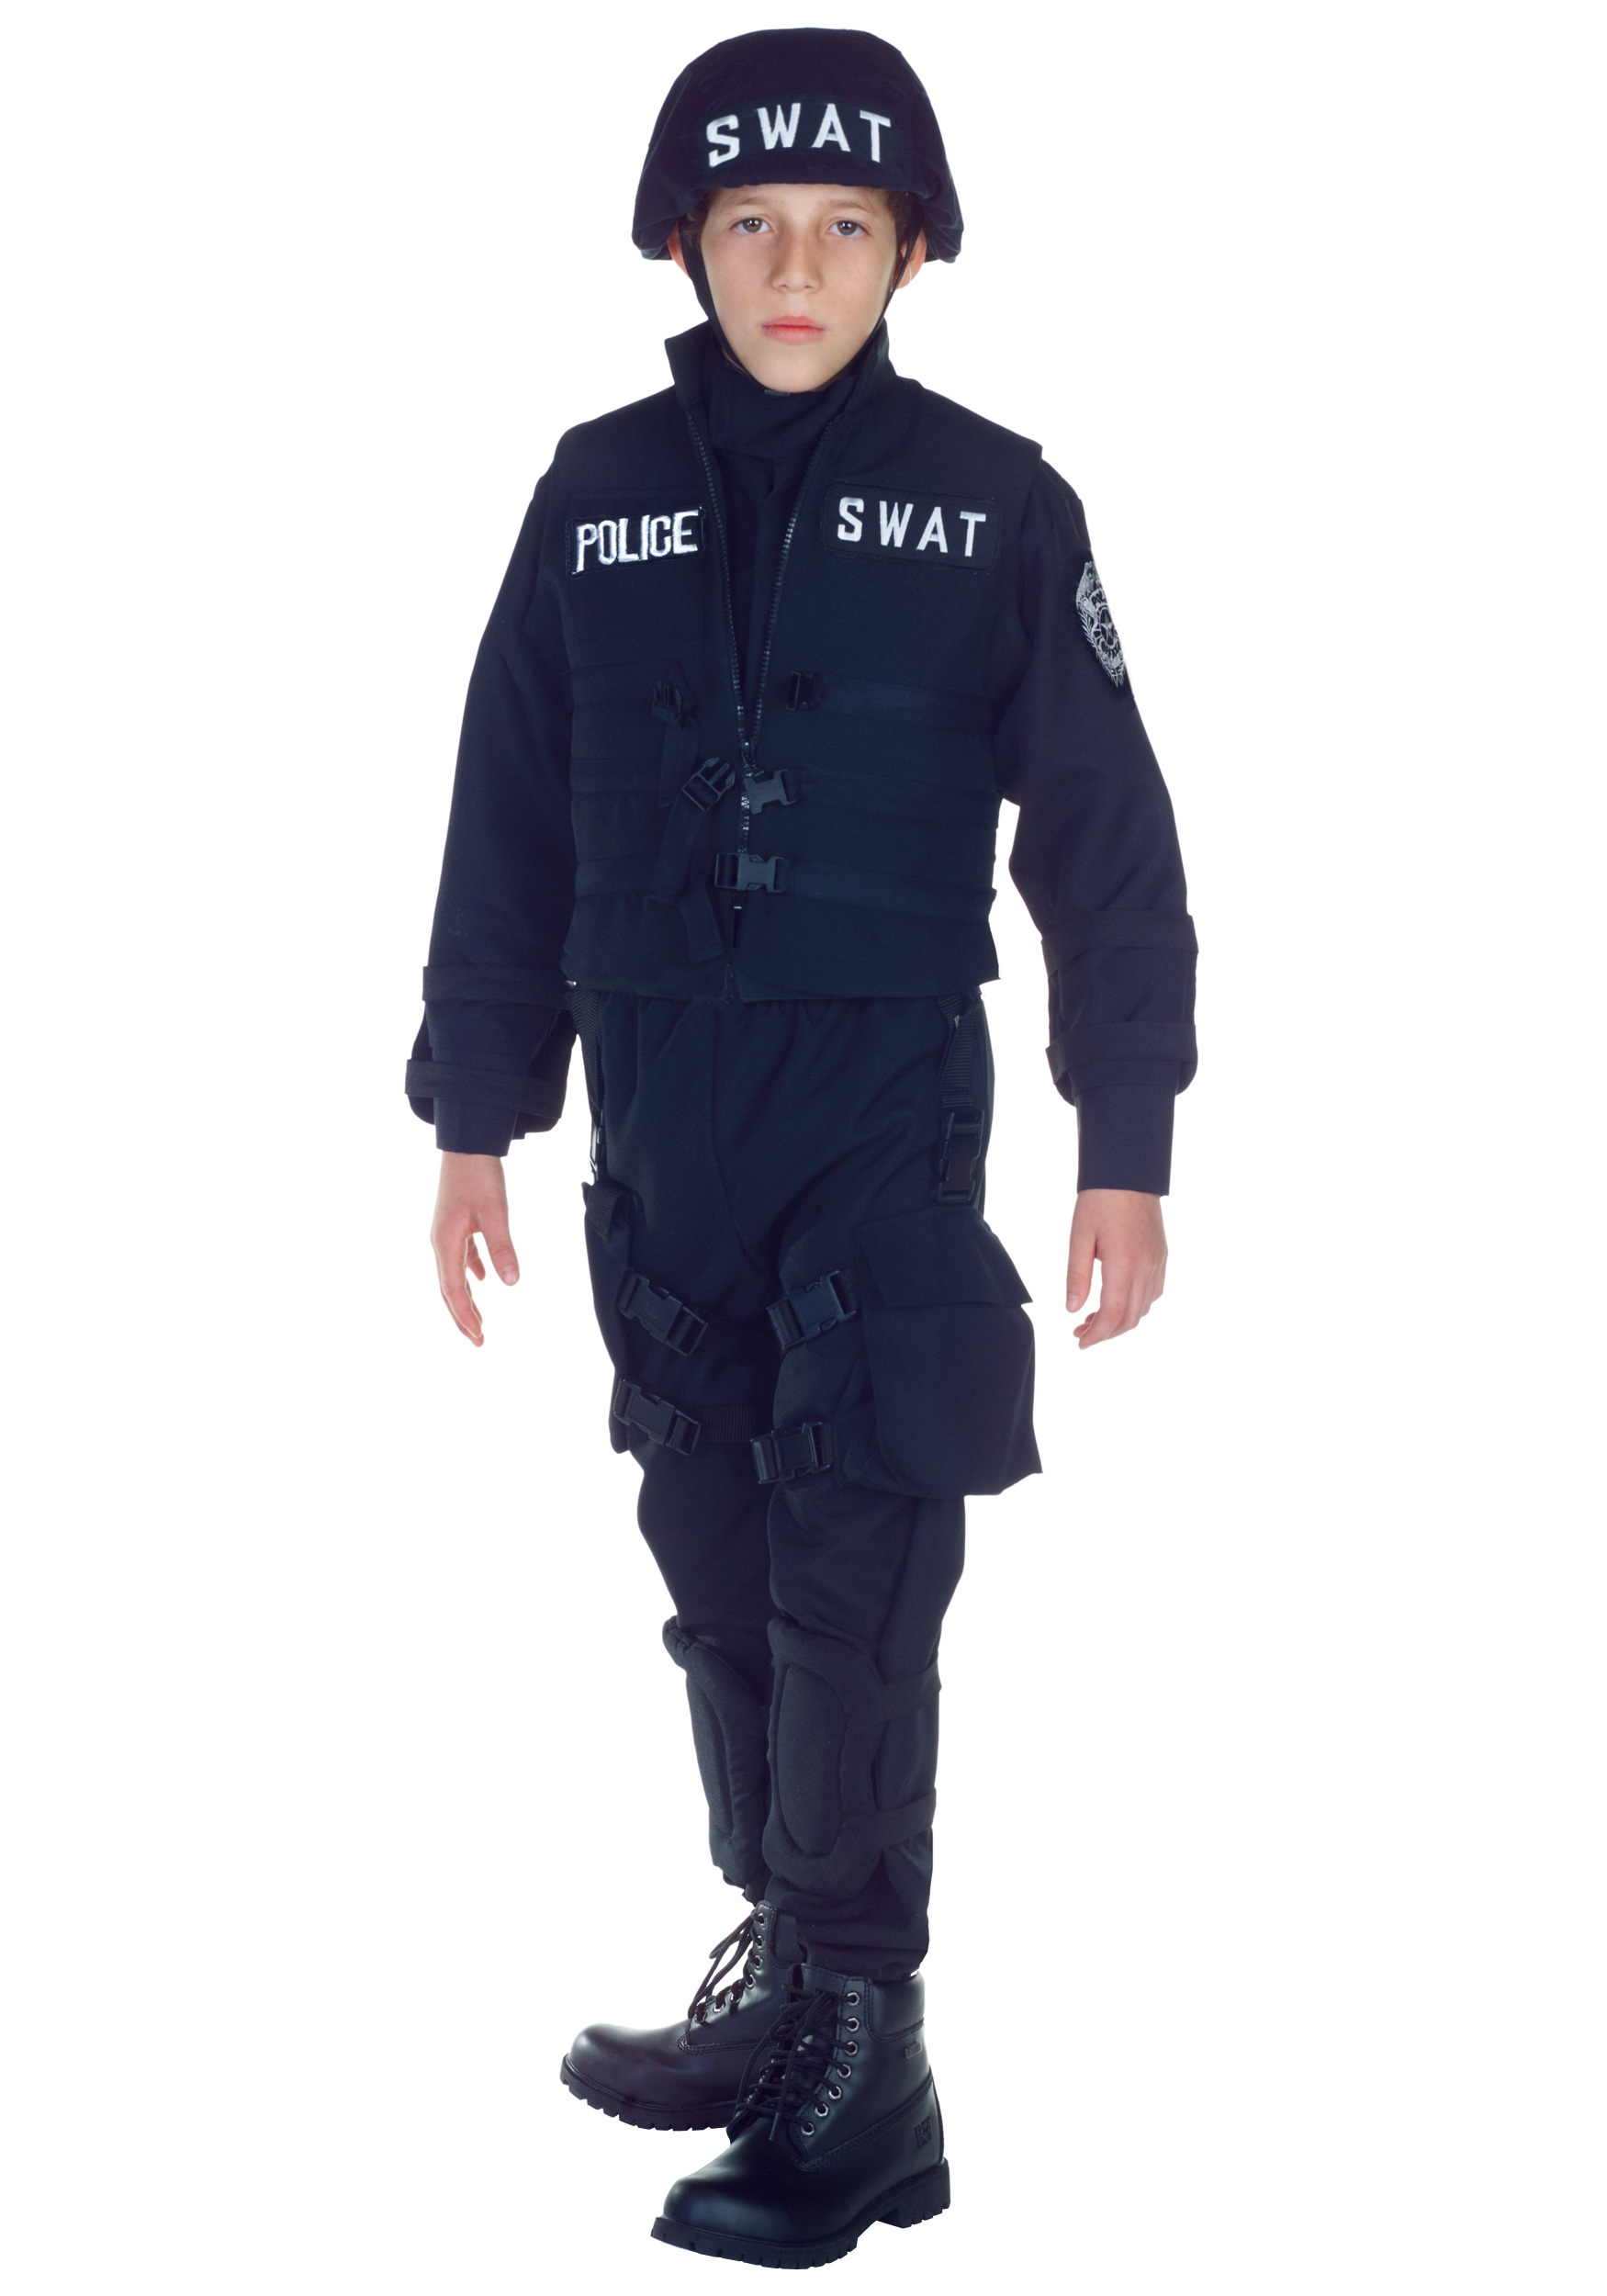 Kids Swat Official Costume Boys Police Officer Uniform